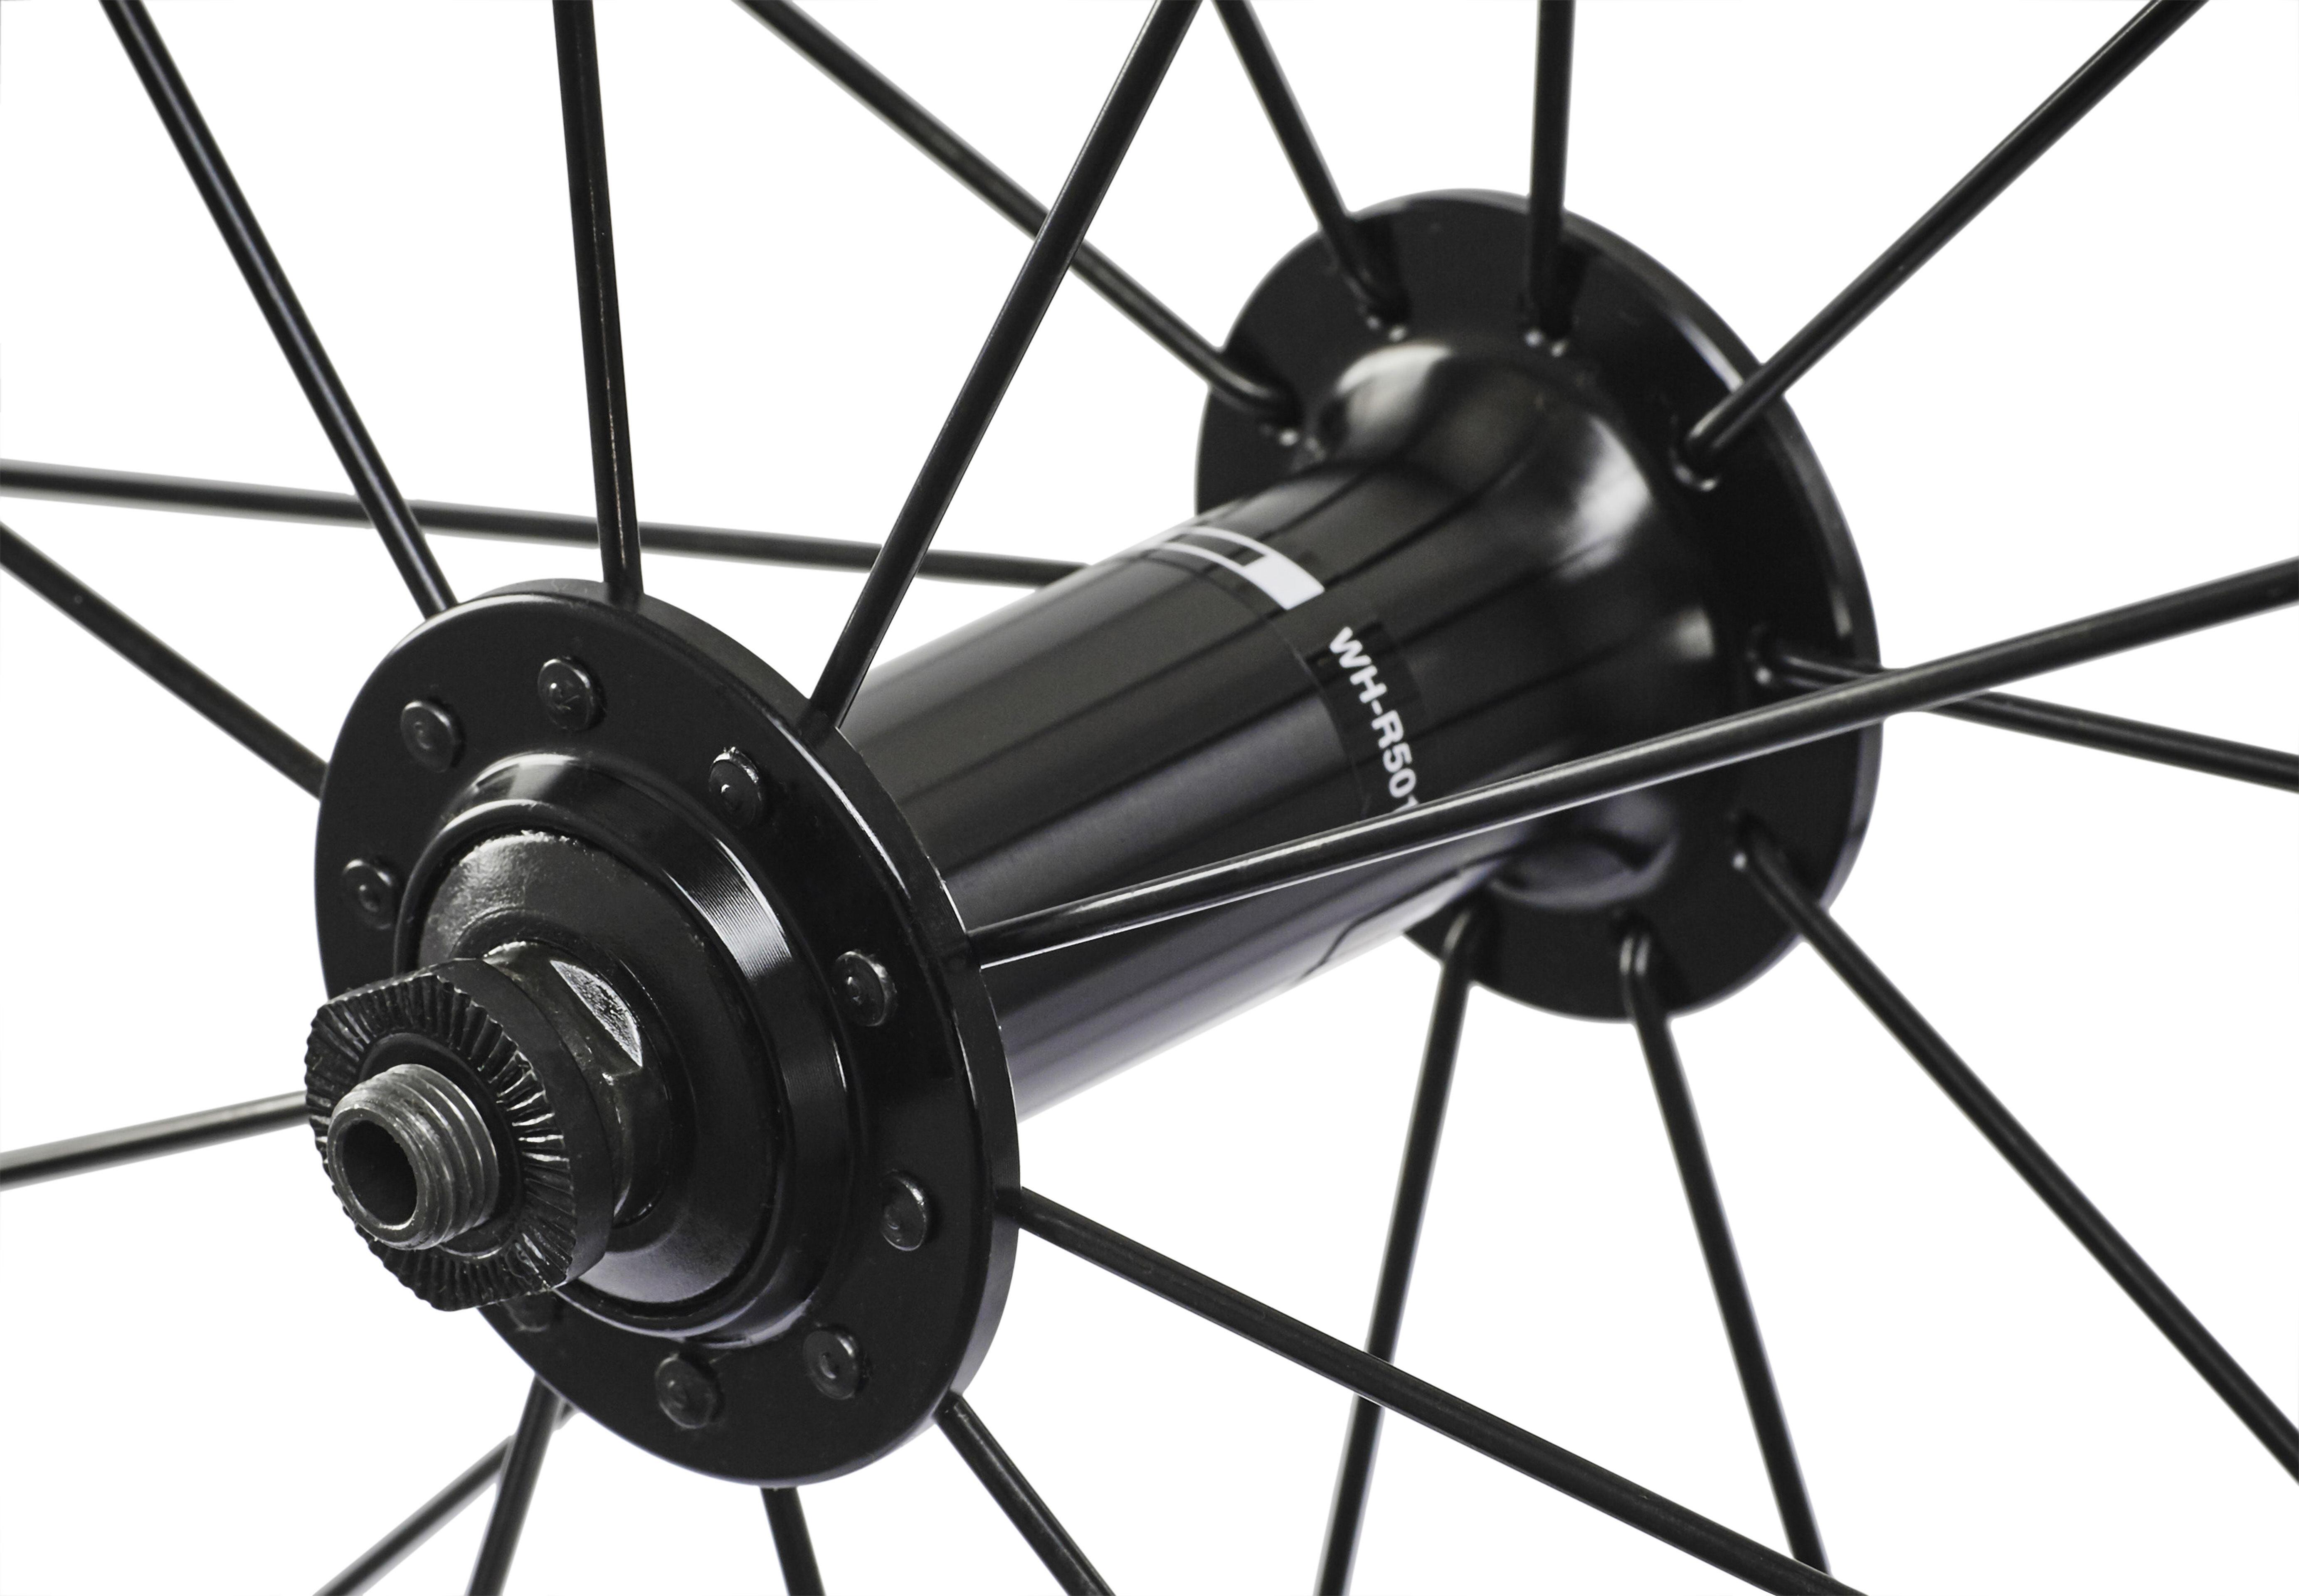 b221f937d40 Shimano WH-R501 700C black at Bikester.co.uk